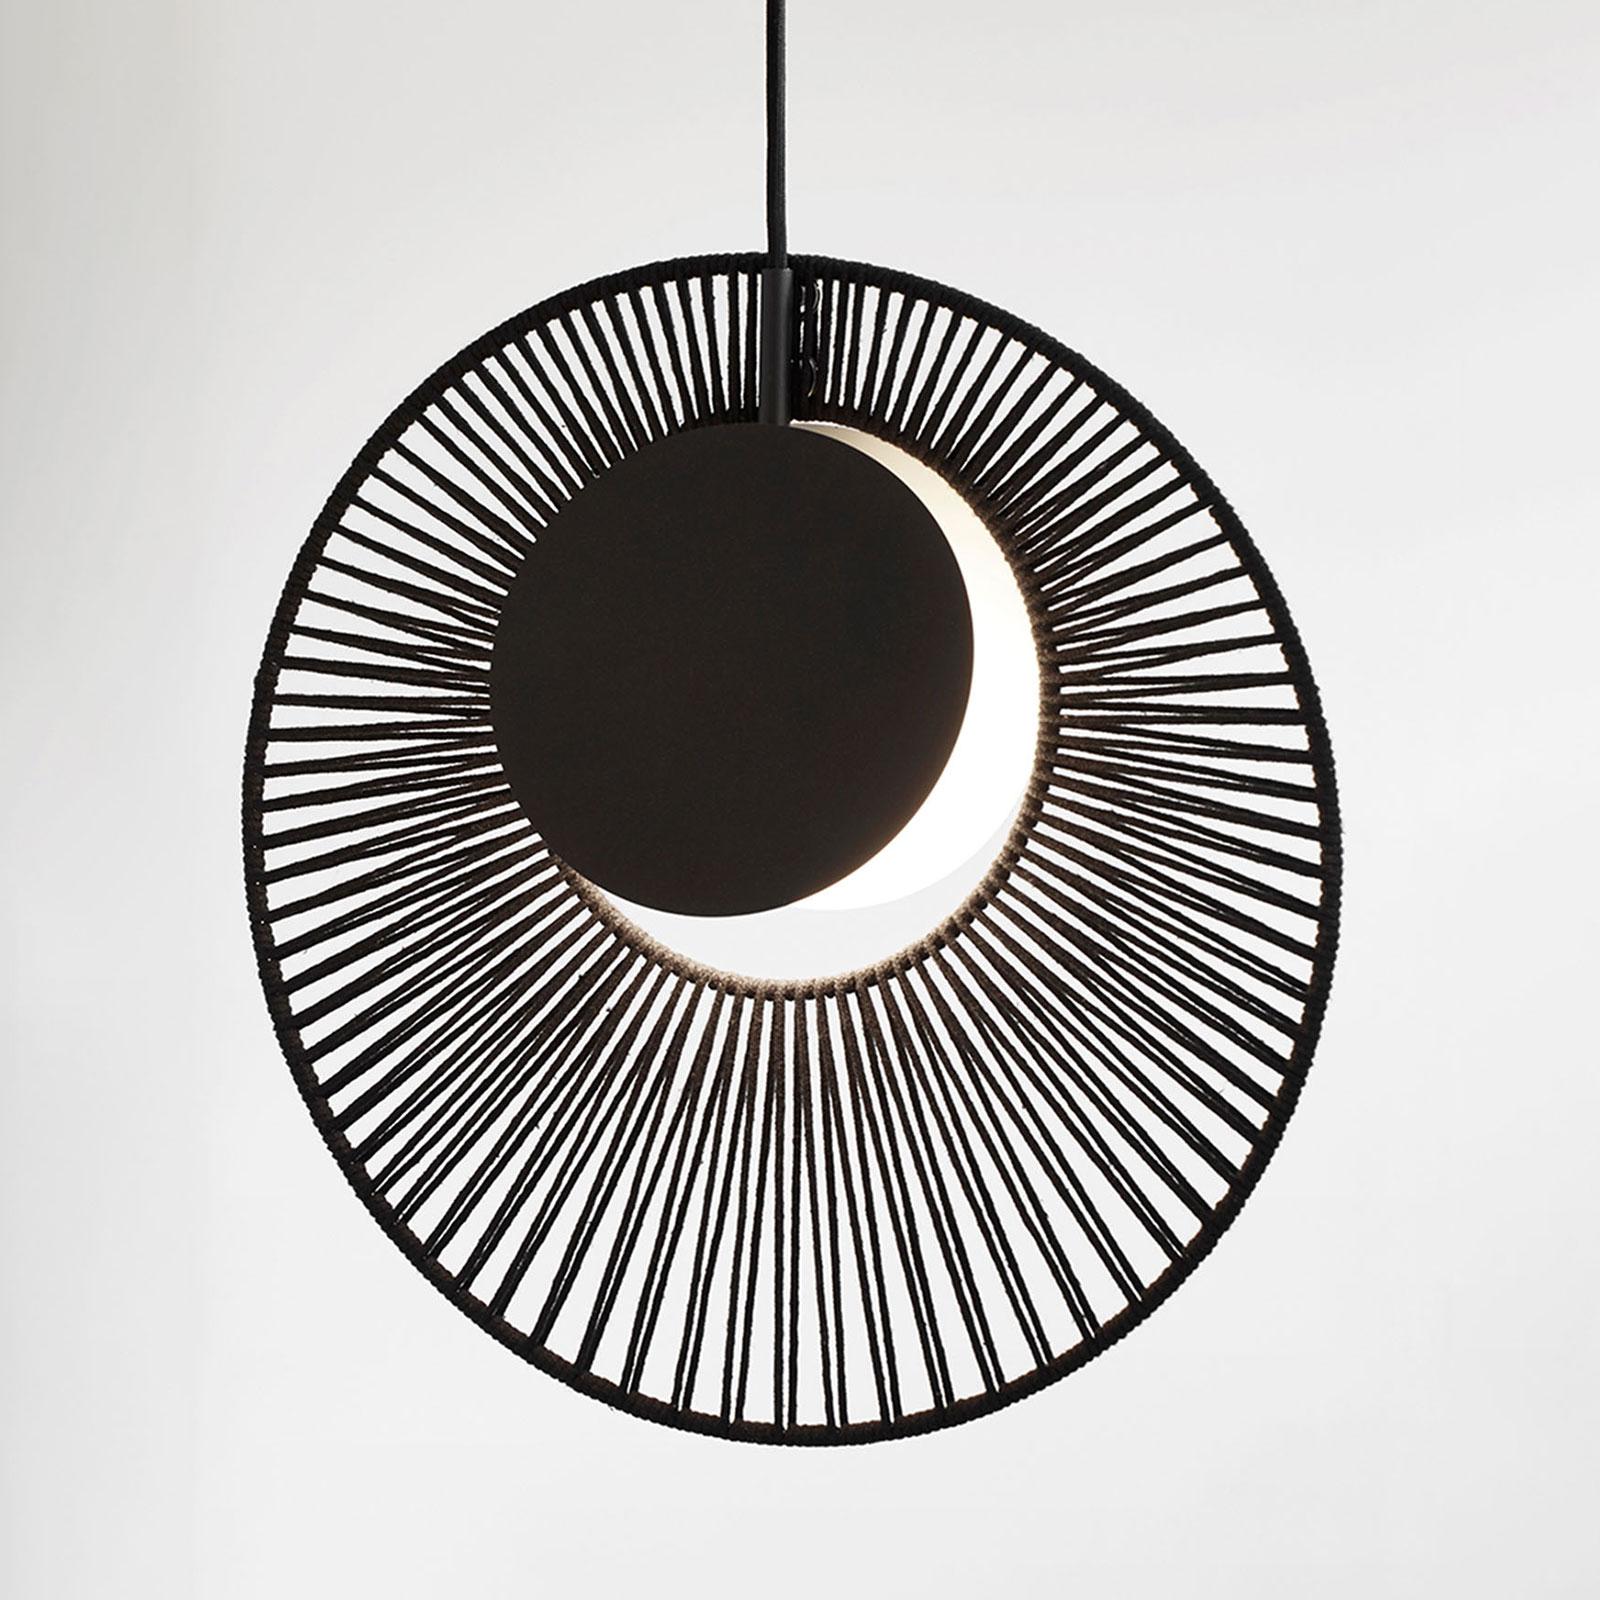 Forestier Oyster designerska lampa wisząca, czarna